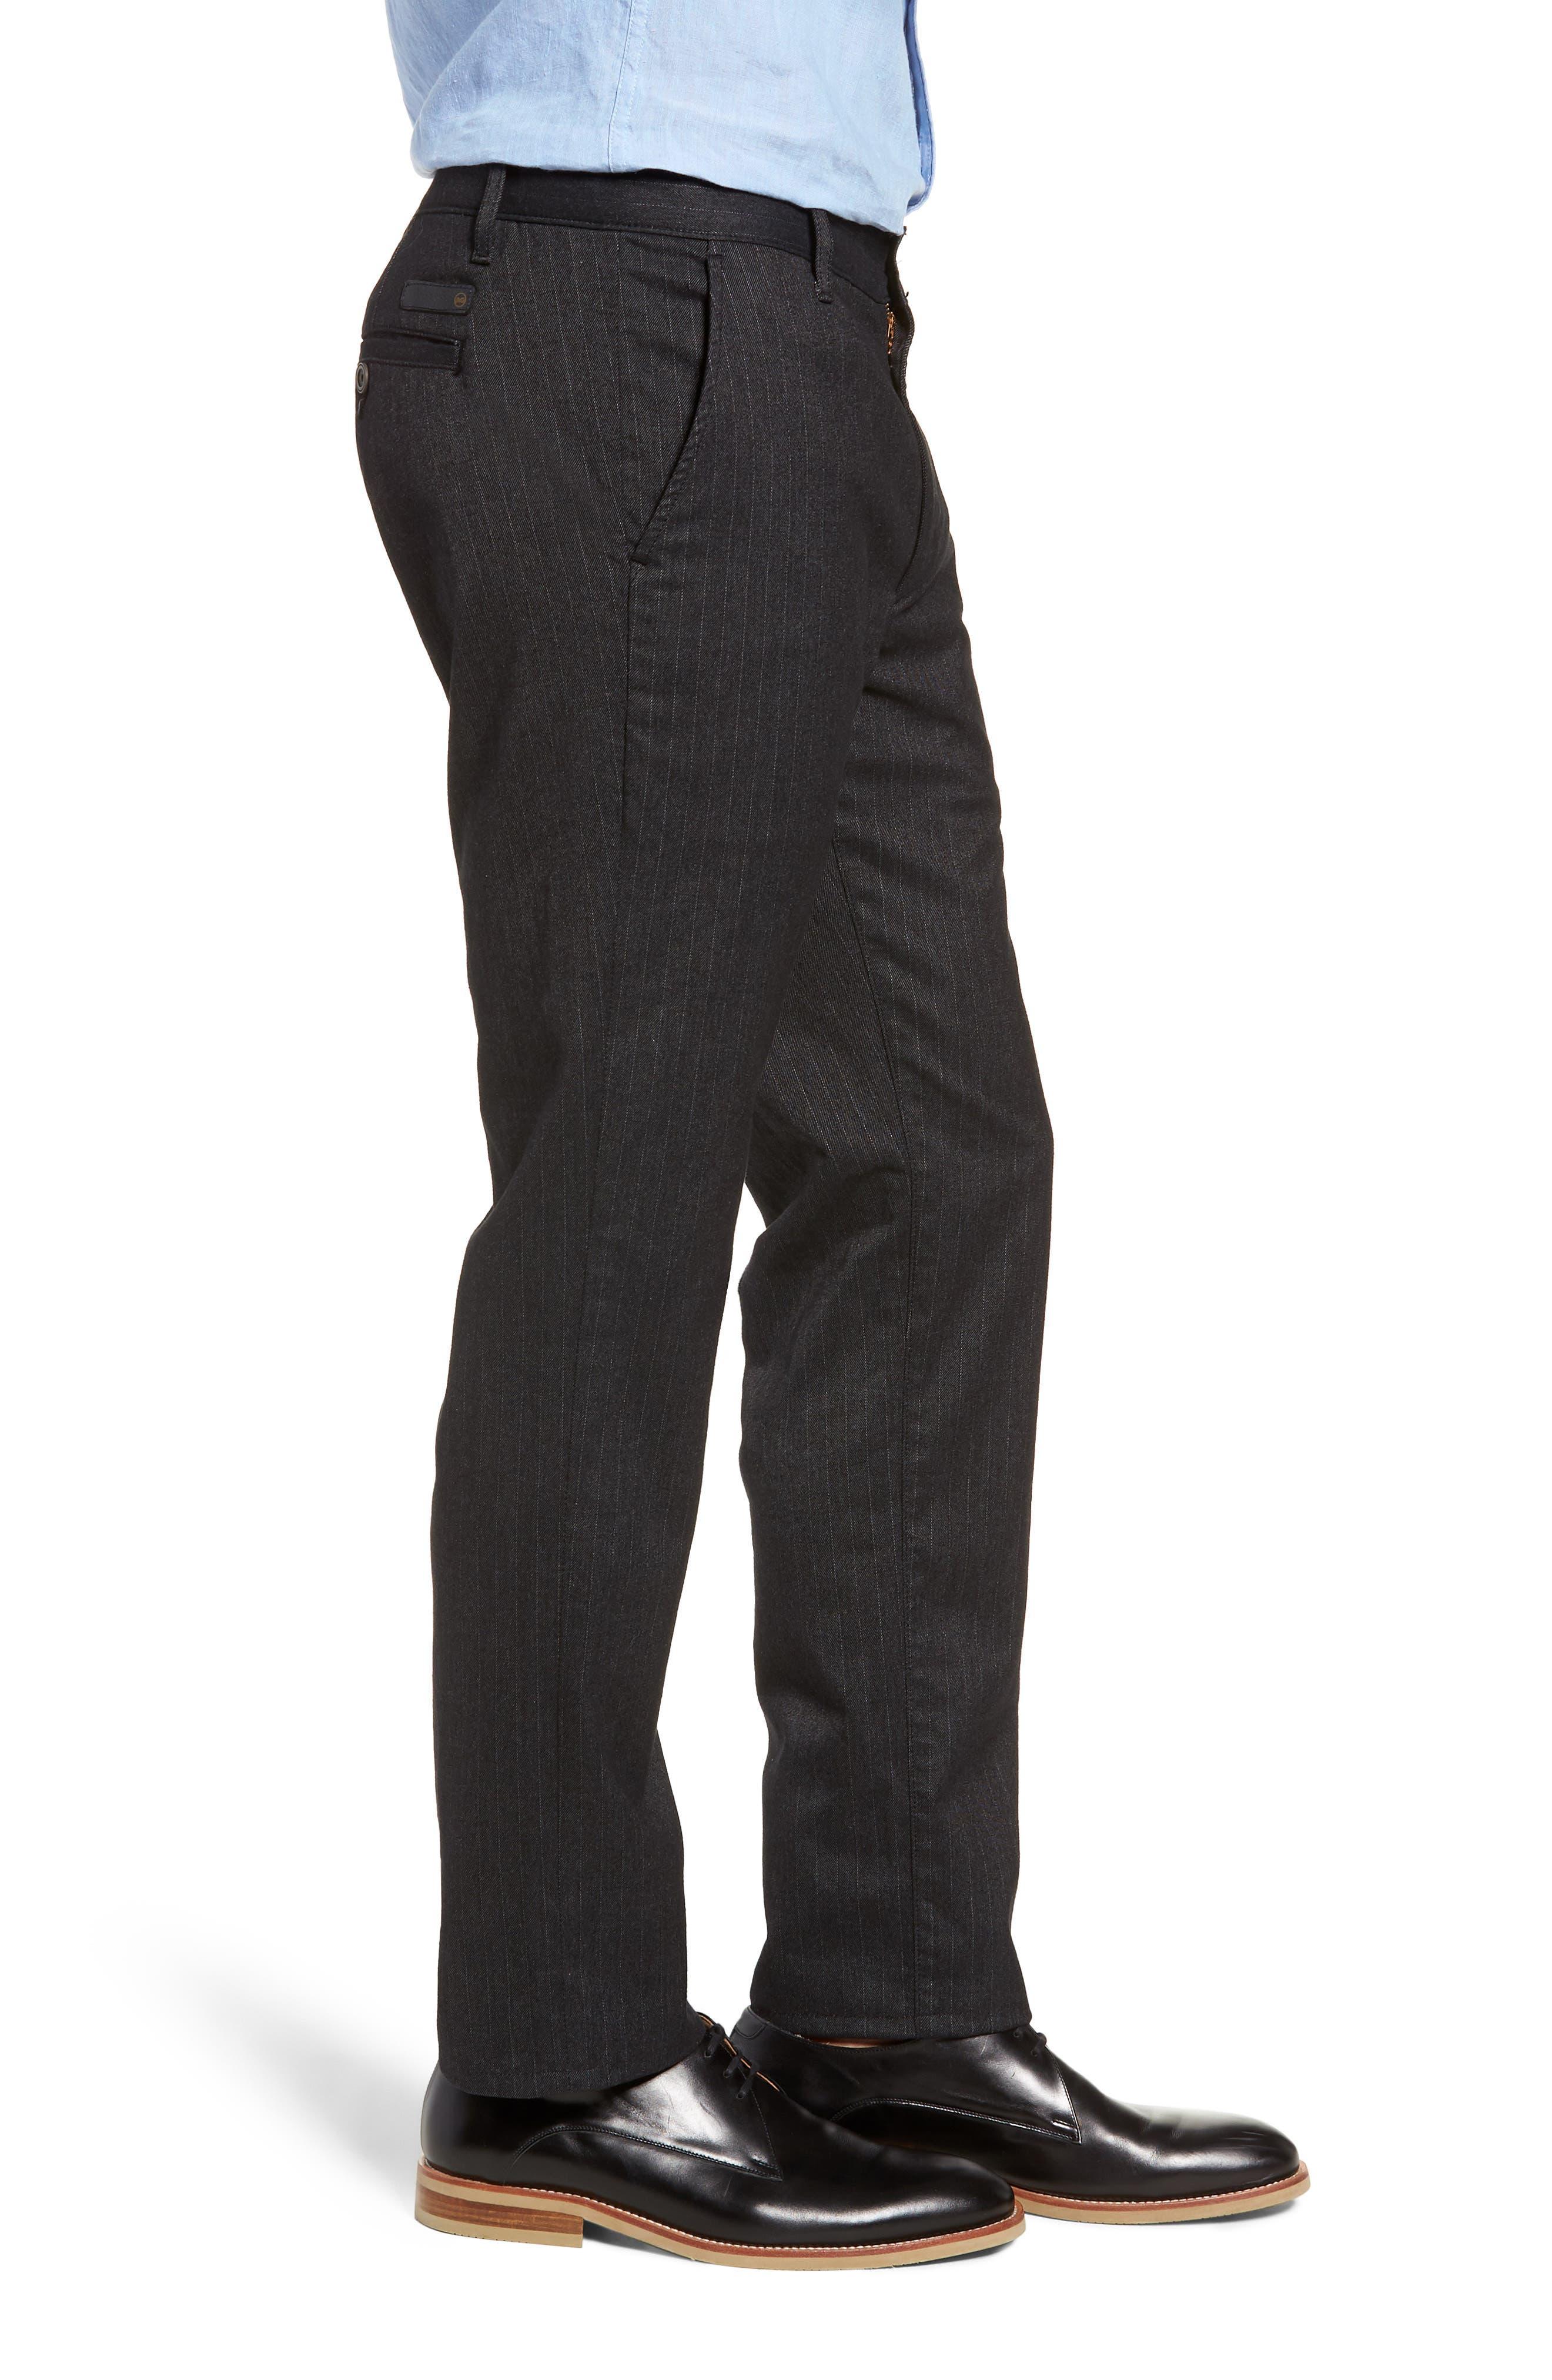 Marshall Slim Fit Pinstripe Pants,                             Alternate thumbnail 3, color,                             HEATHERED MELANGE BLACK